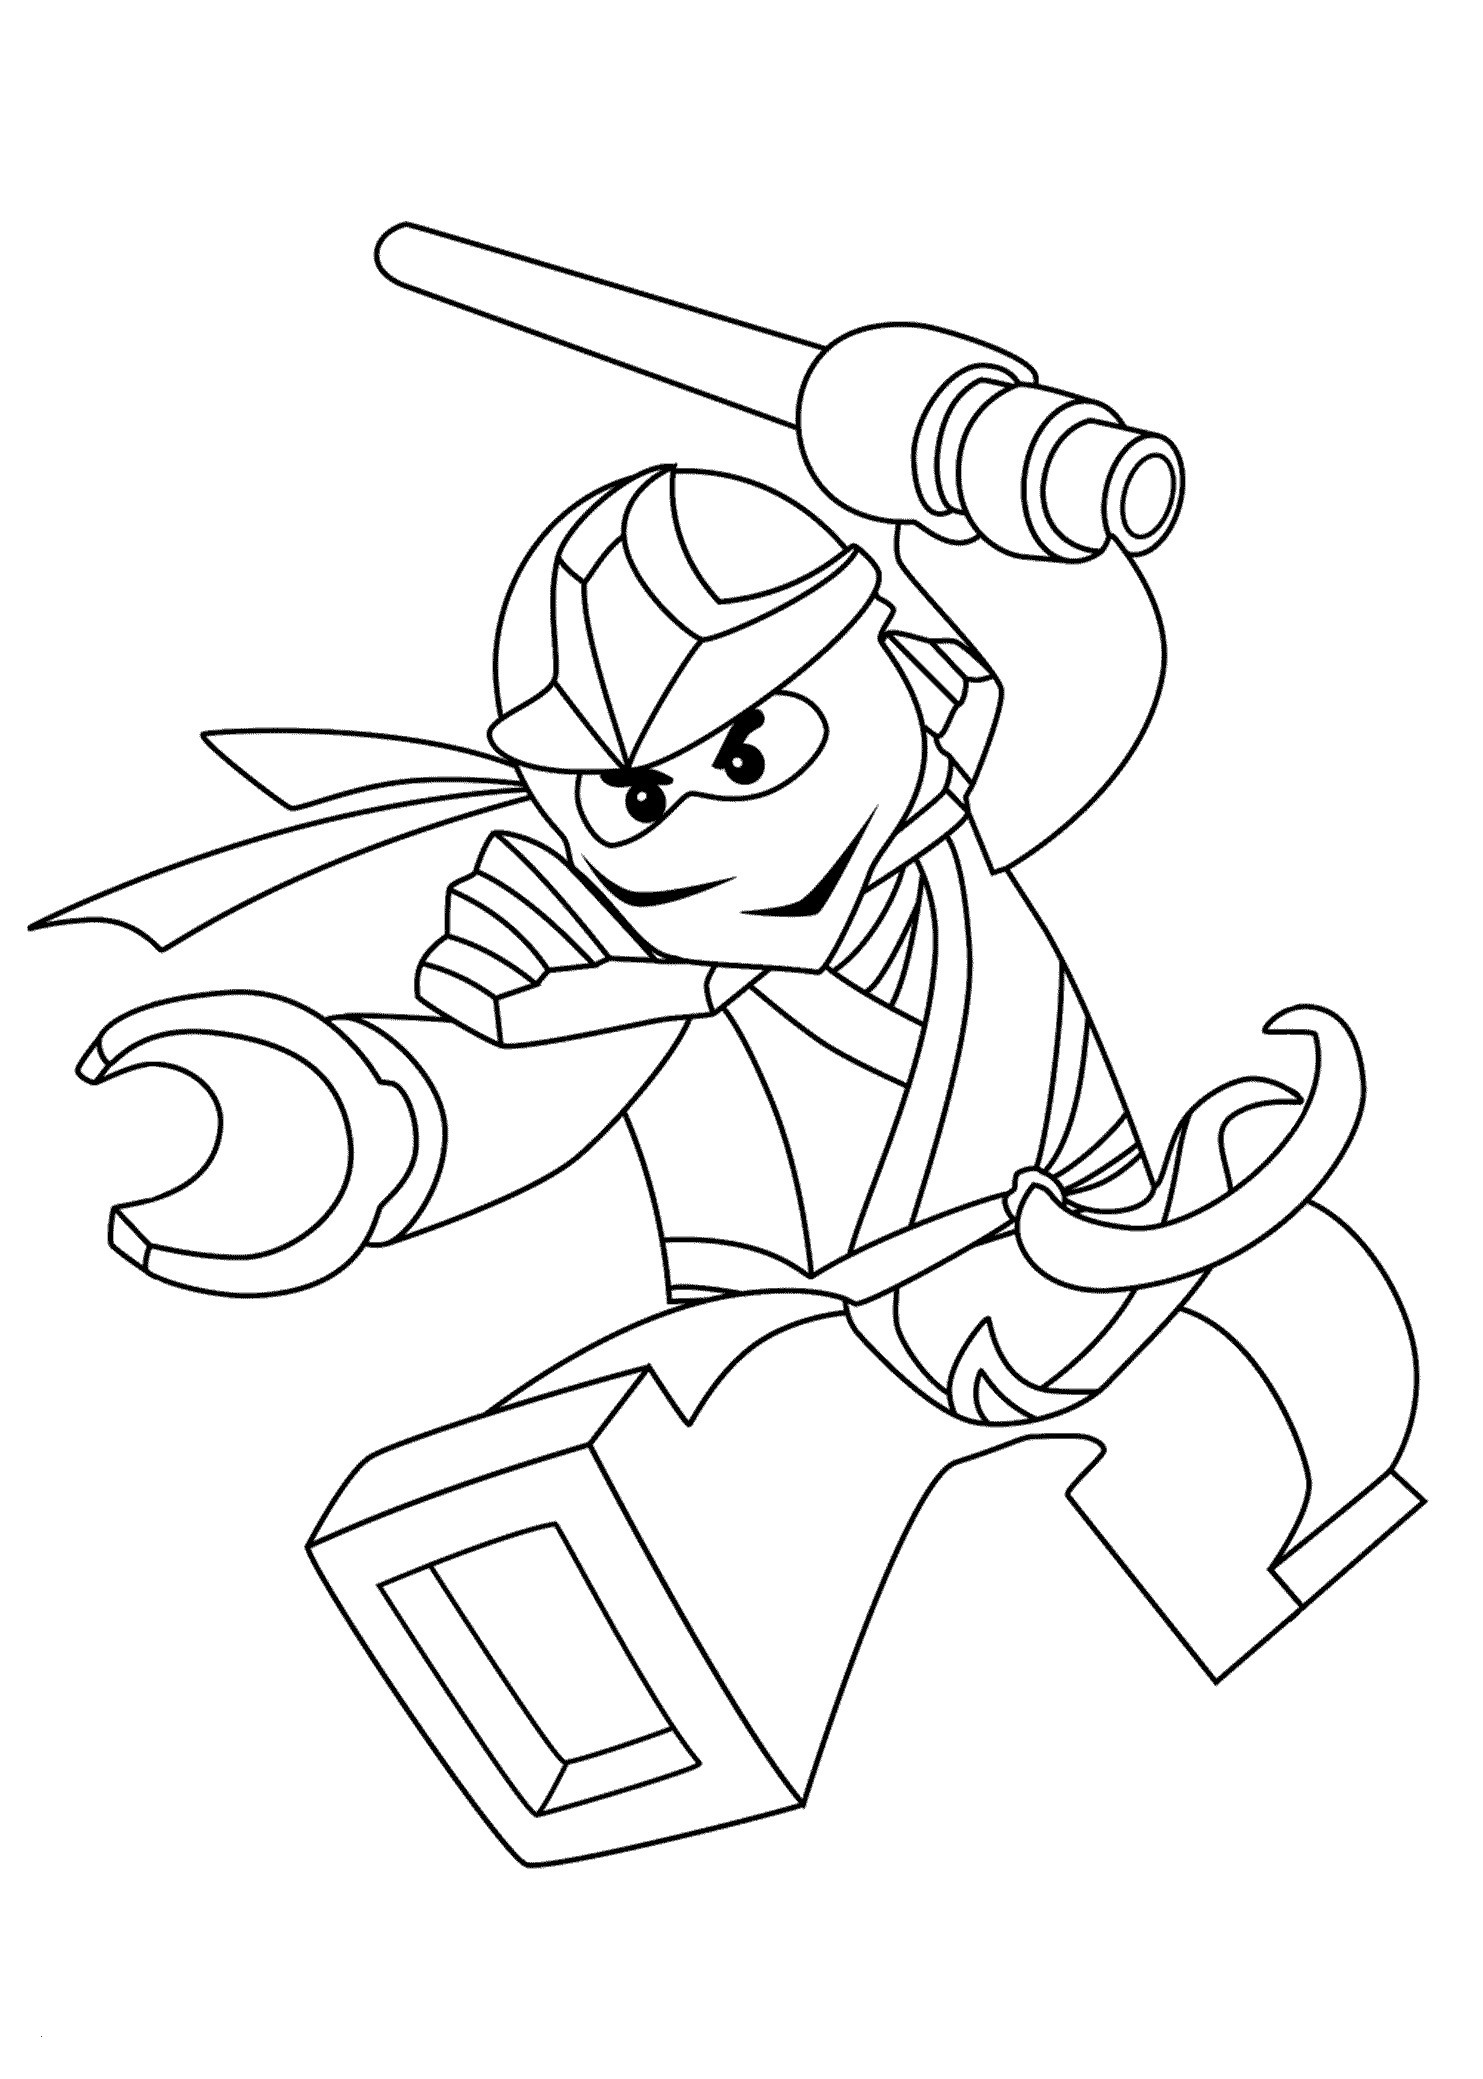 Ninjago Lloyd Ausmalbild Neu Zane Ninjago Coloring Pages for Kids Printable Free Einzigartig Sammlung